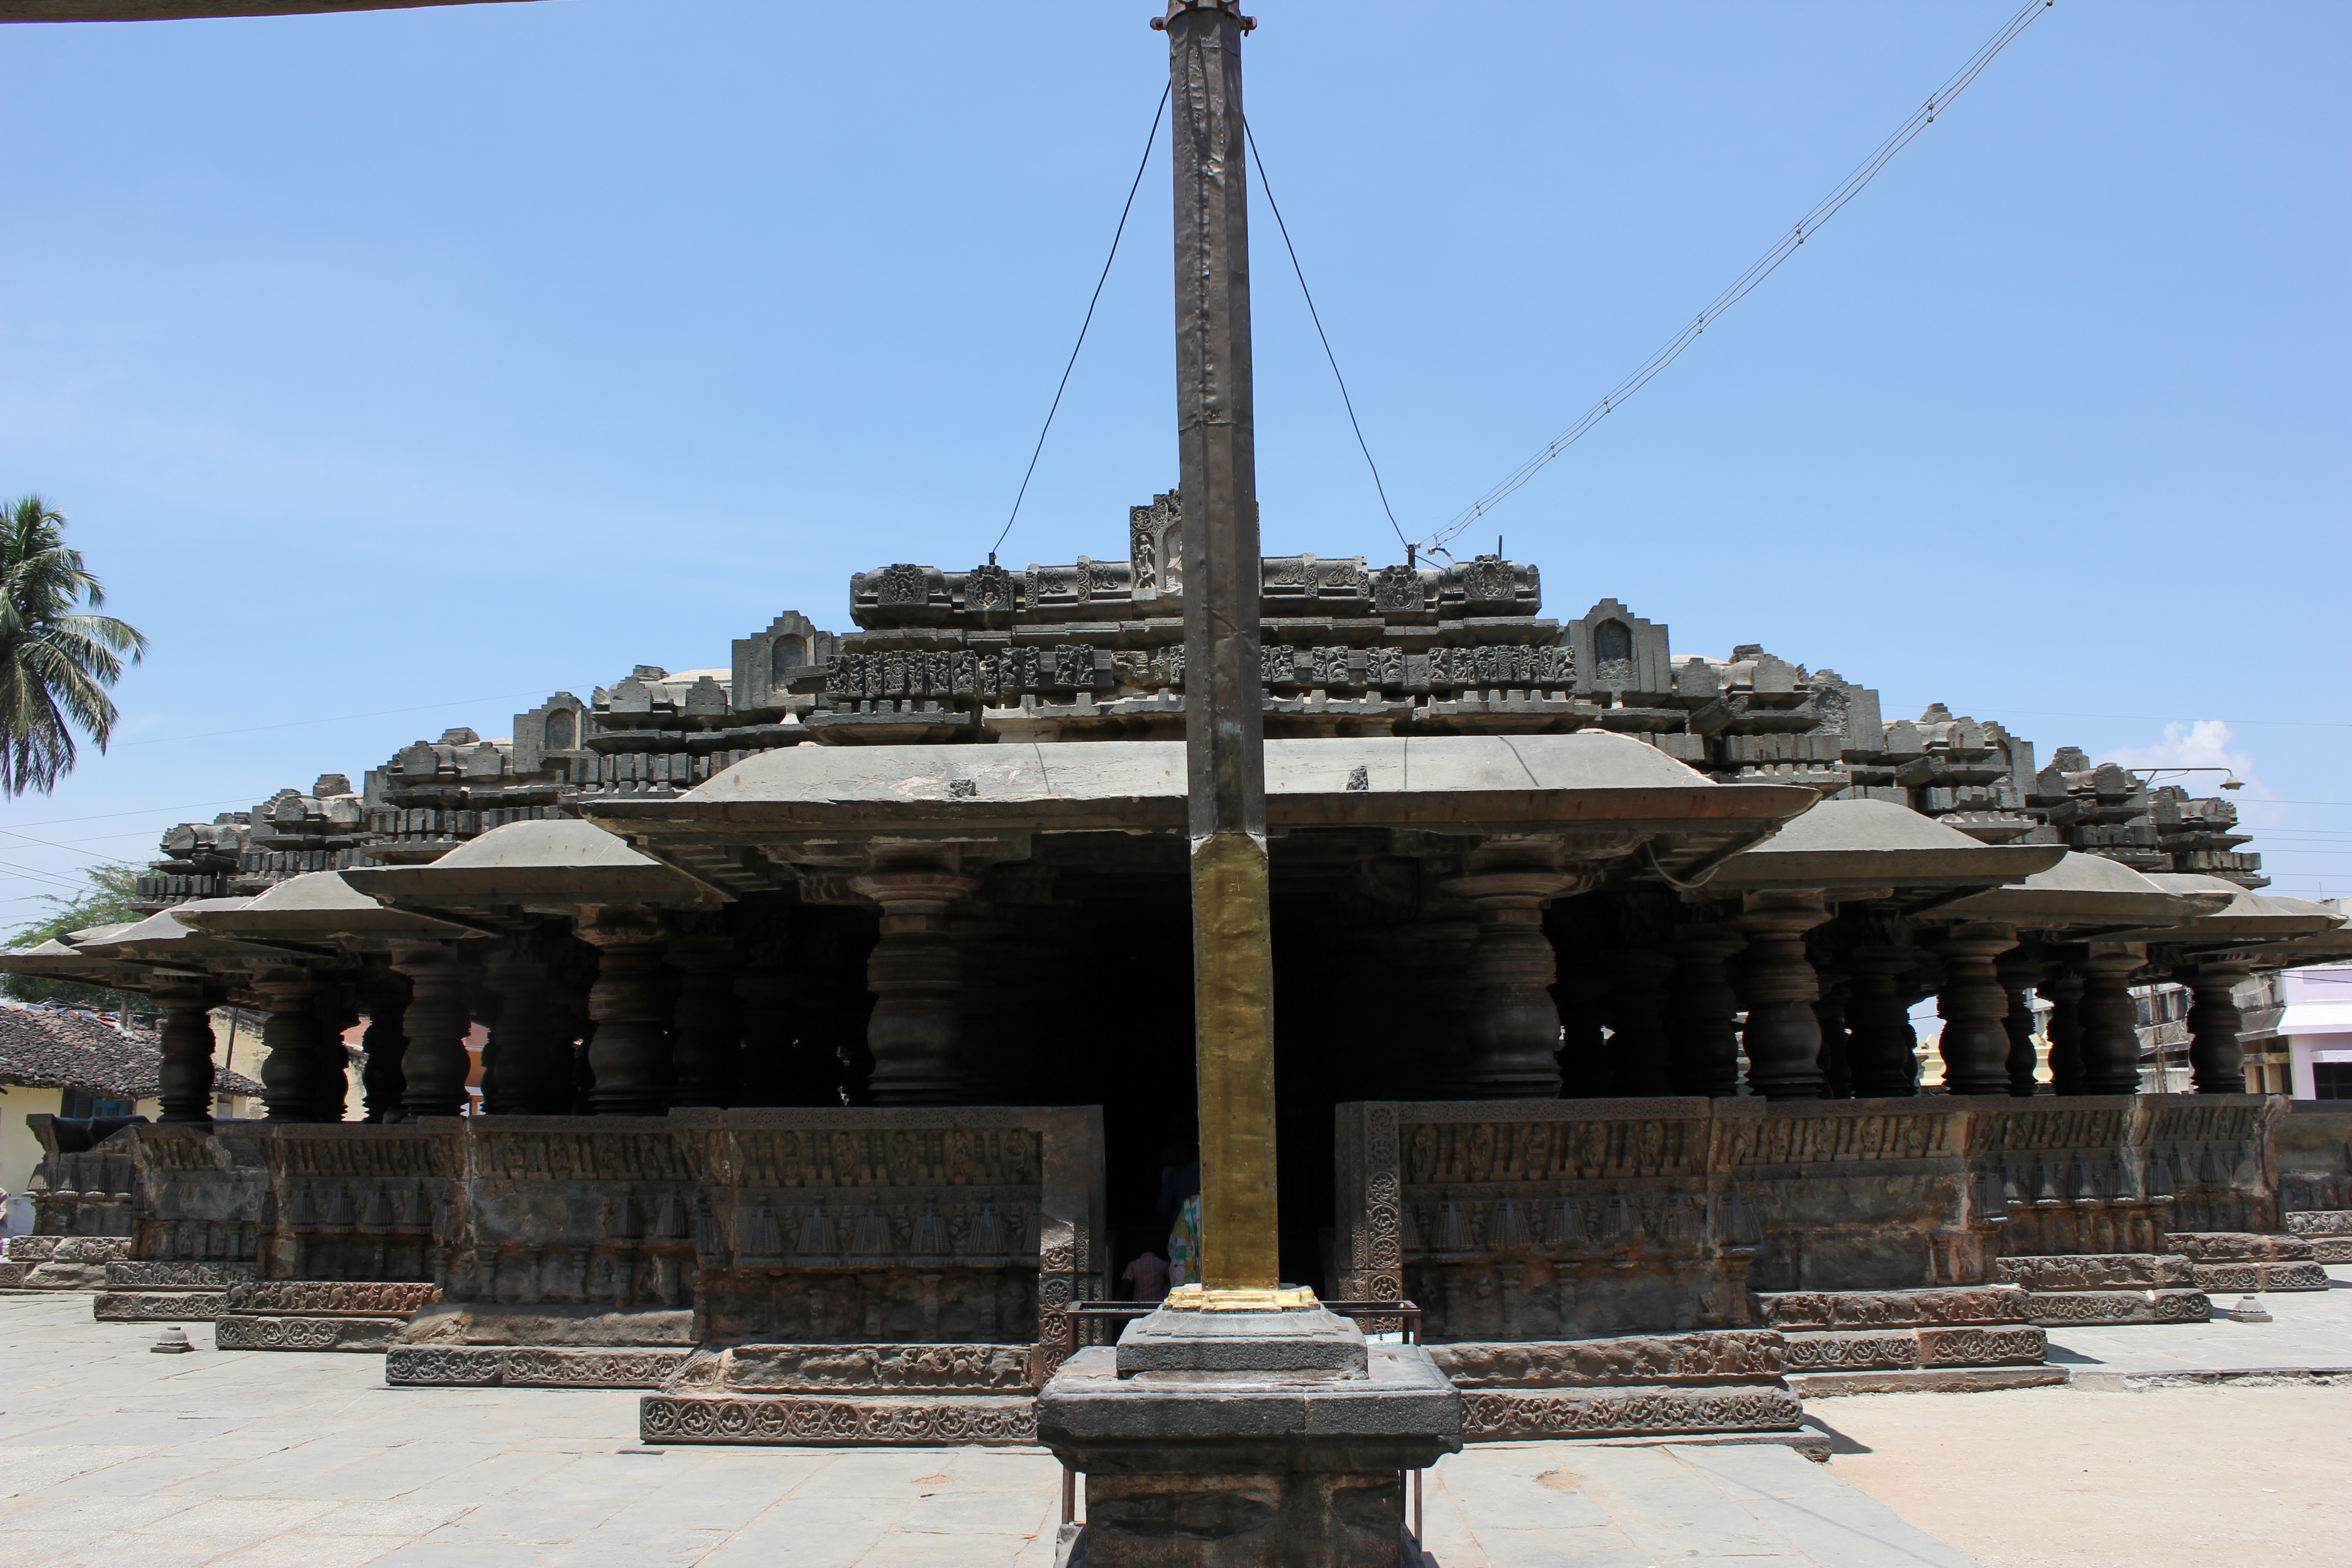 Harihareshwar temple - Picture of Harihareshwar Beach, Shrivardhan Harihareshwar temple shriwardhan photos